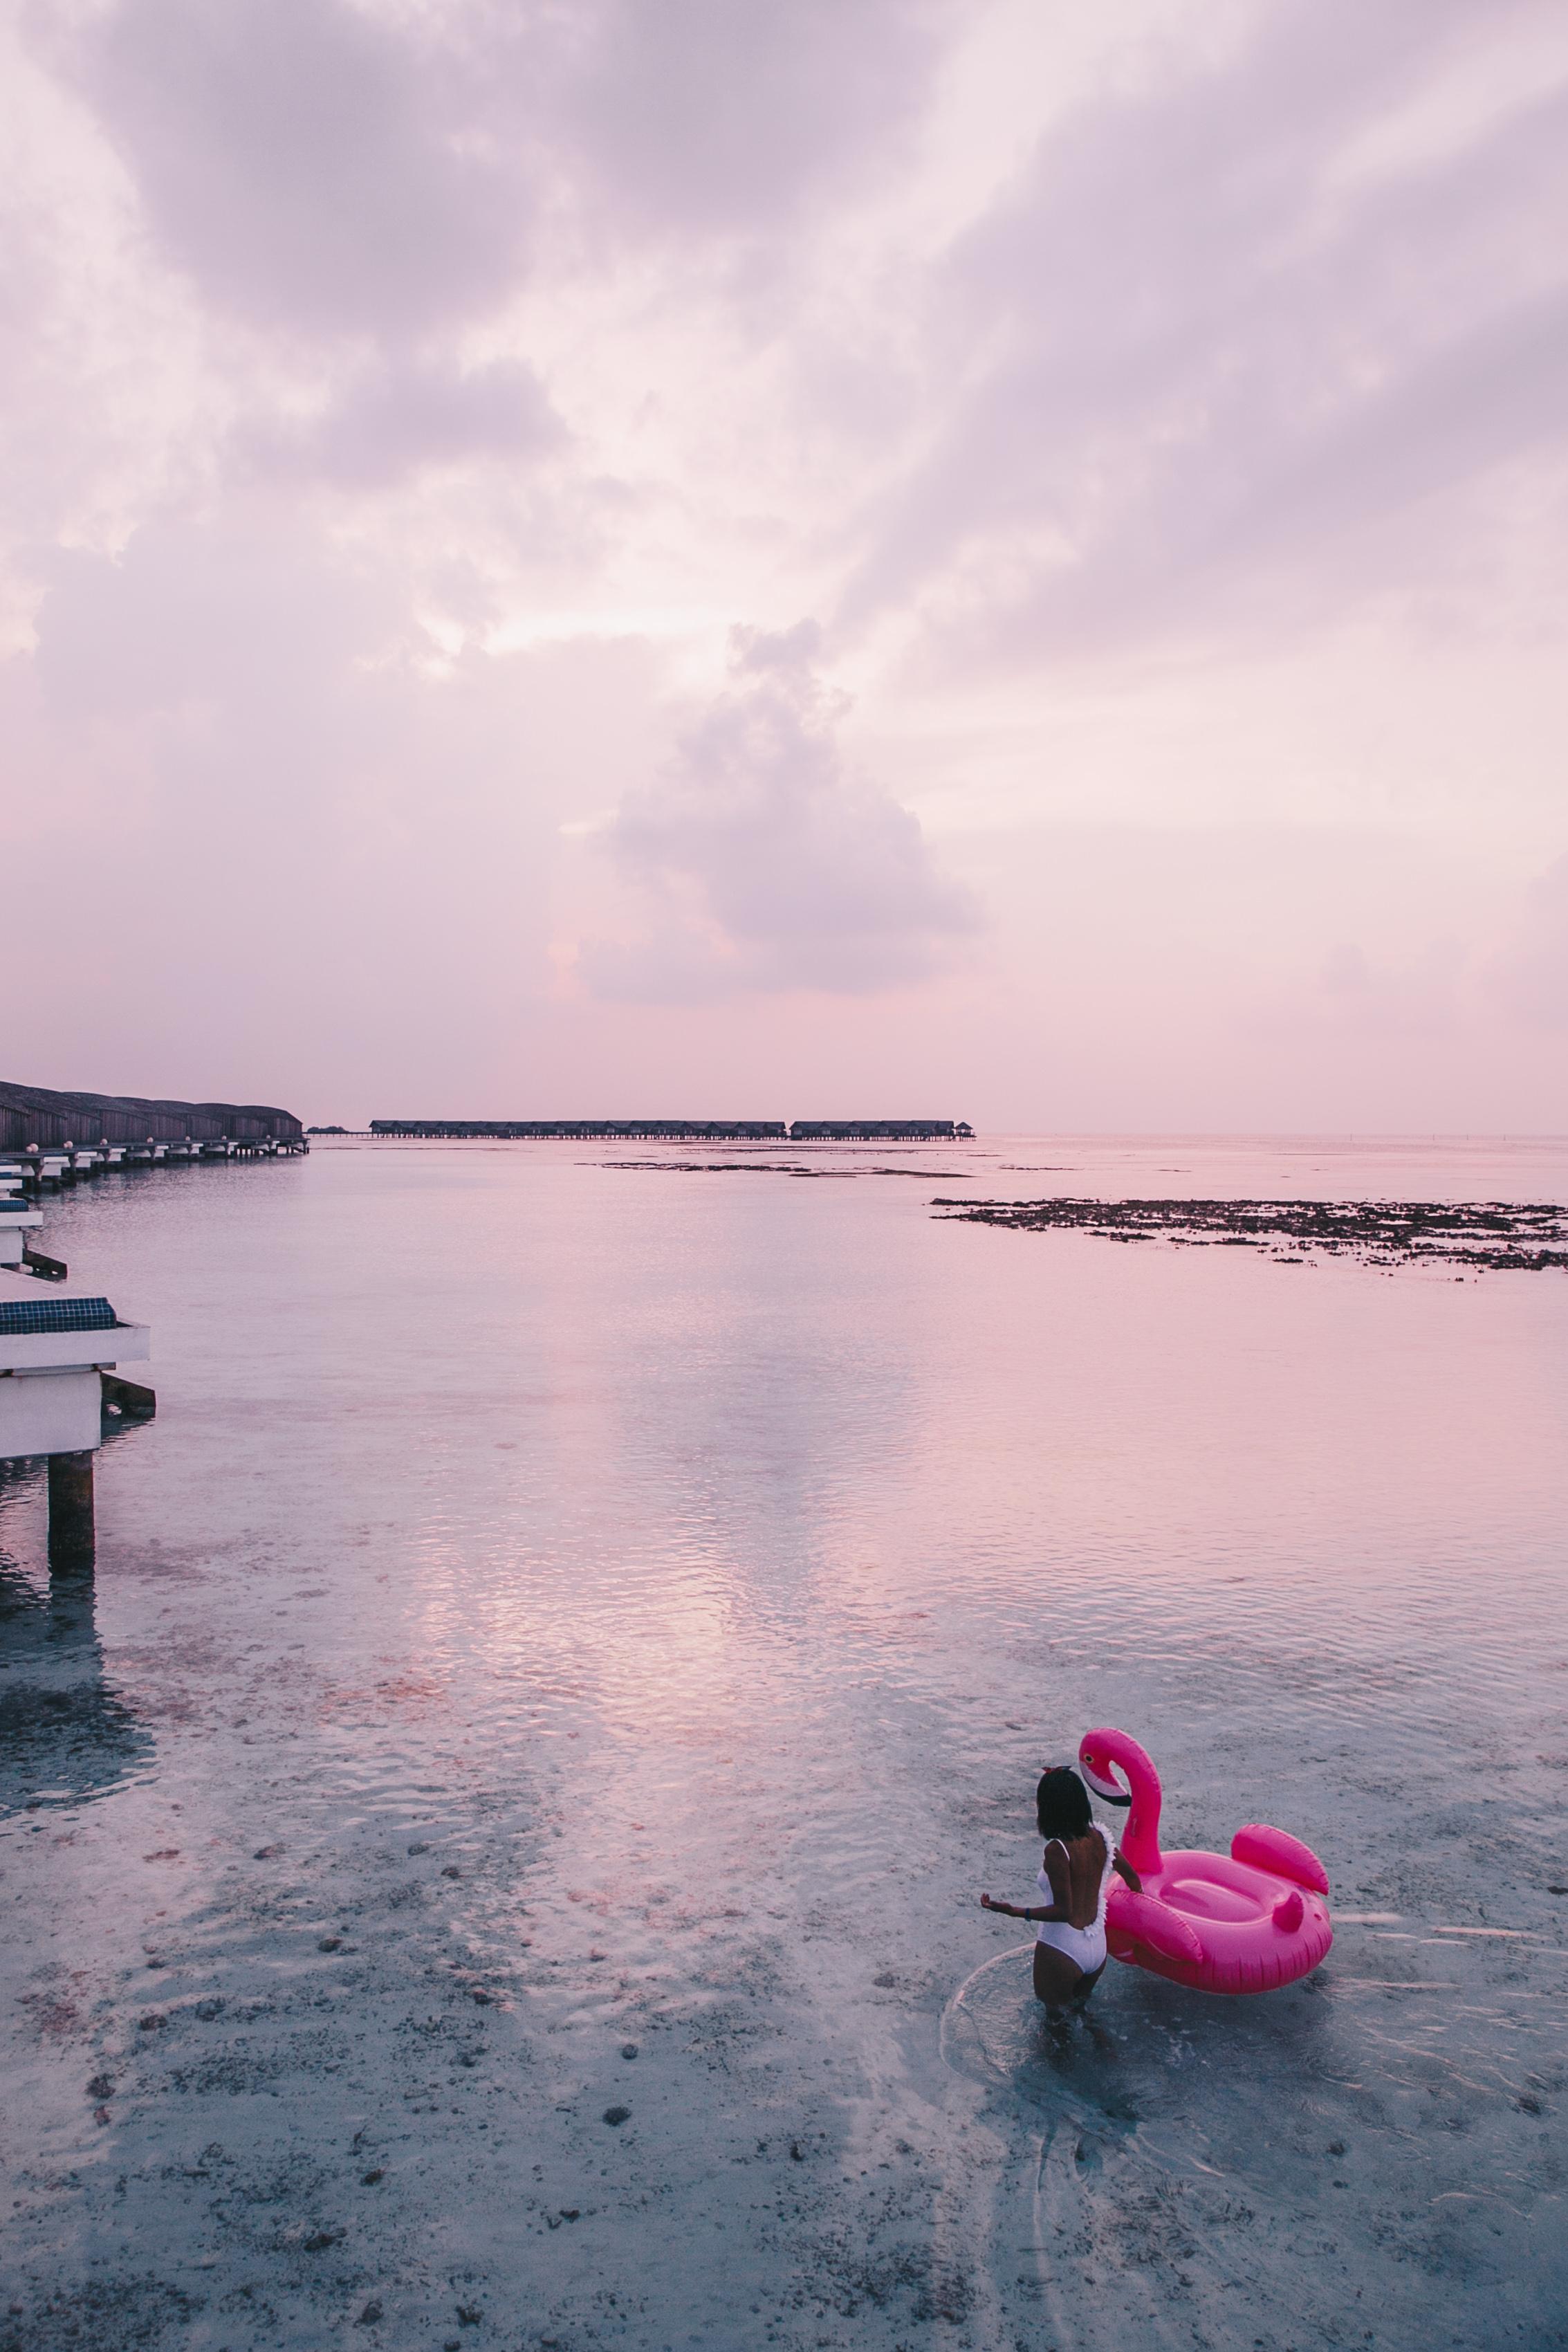 Maldives_Jan18_Lichipan-55.jpg